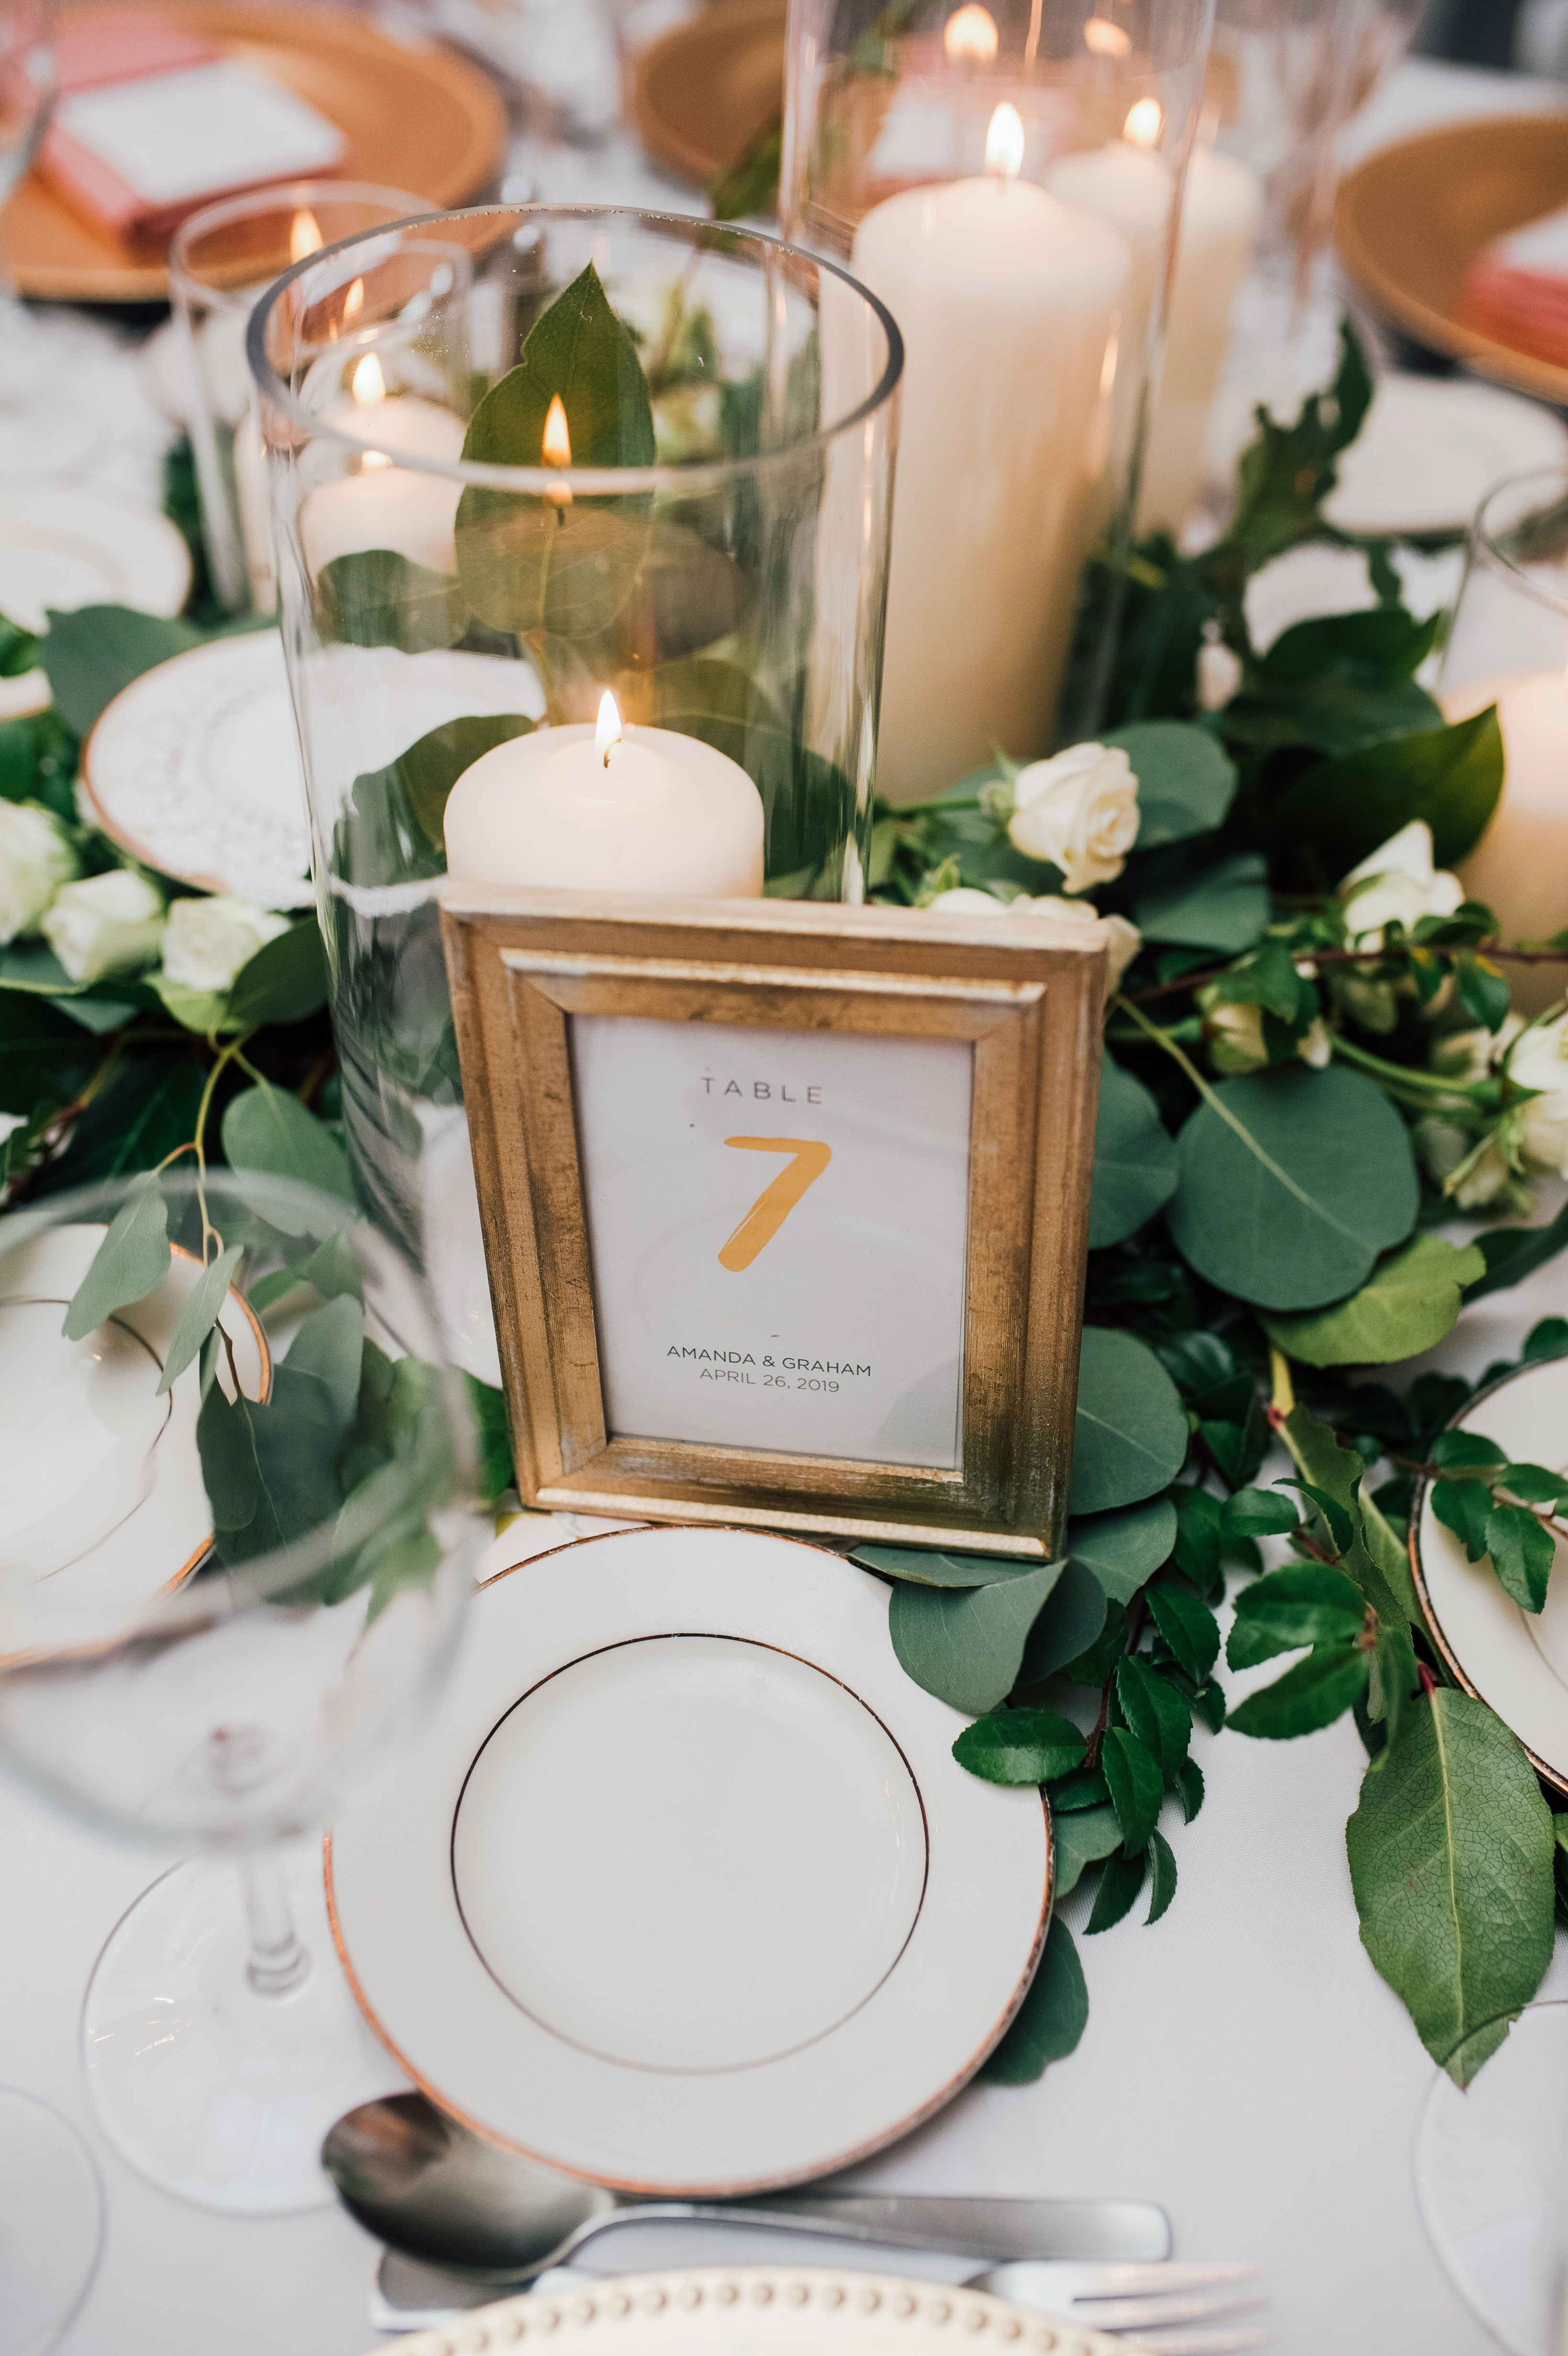 Romantic Wedding Ideas Gold Frame Table Number Summer Wedding Table Arra Gold Table Numbers Wedding Table Numbers Wedding Rustic Table Arrangements Wedding